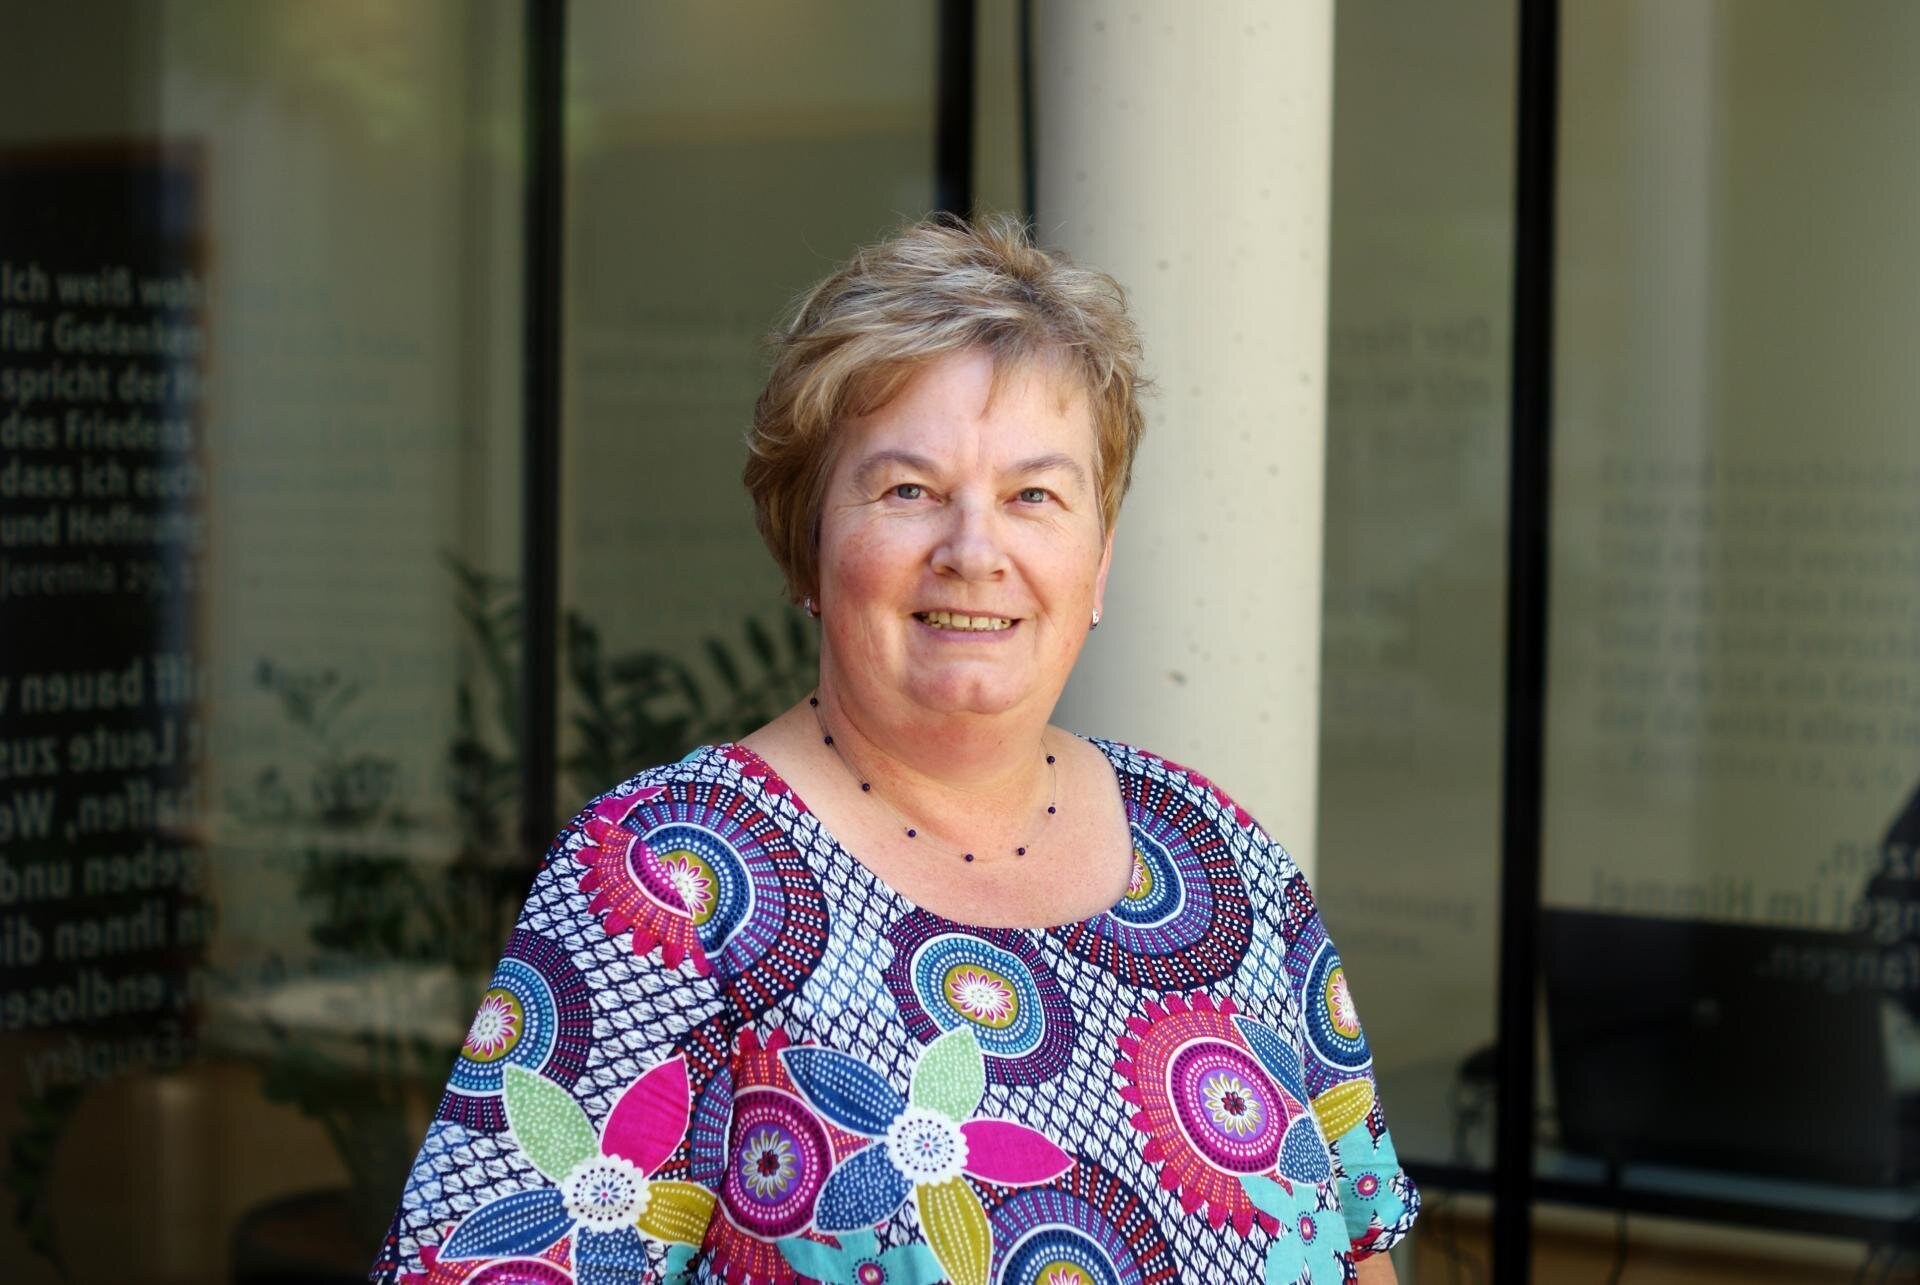 Inge Rudolph